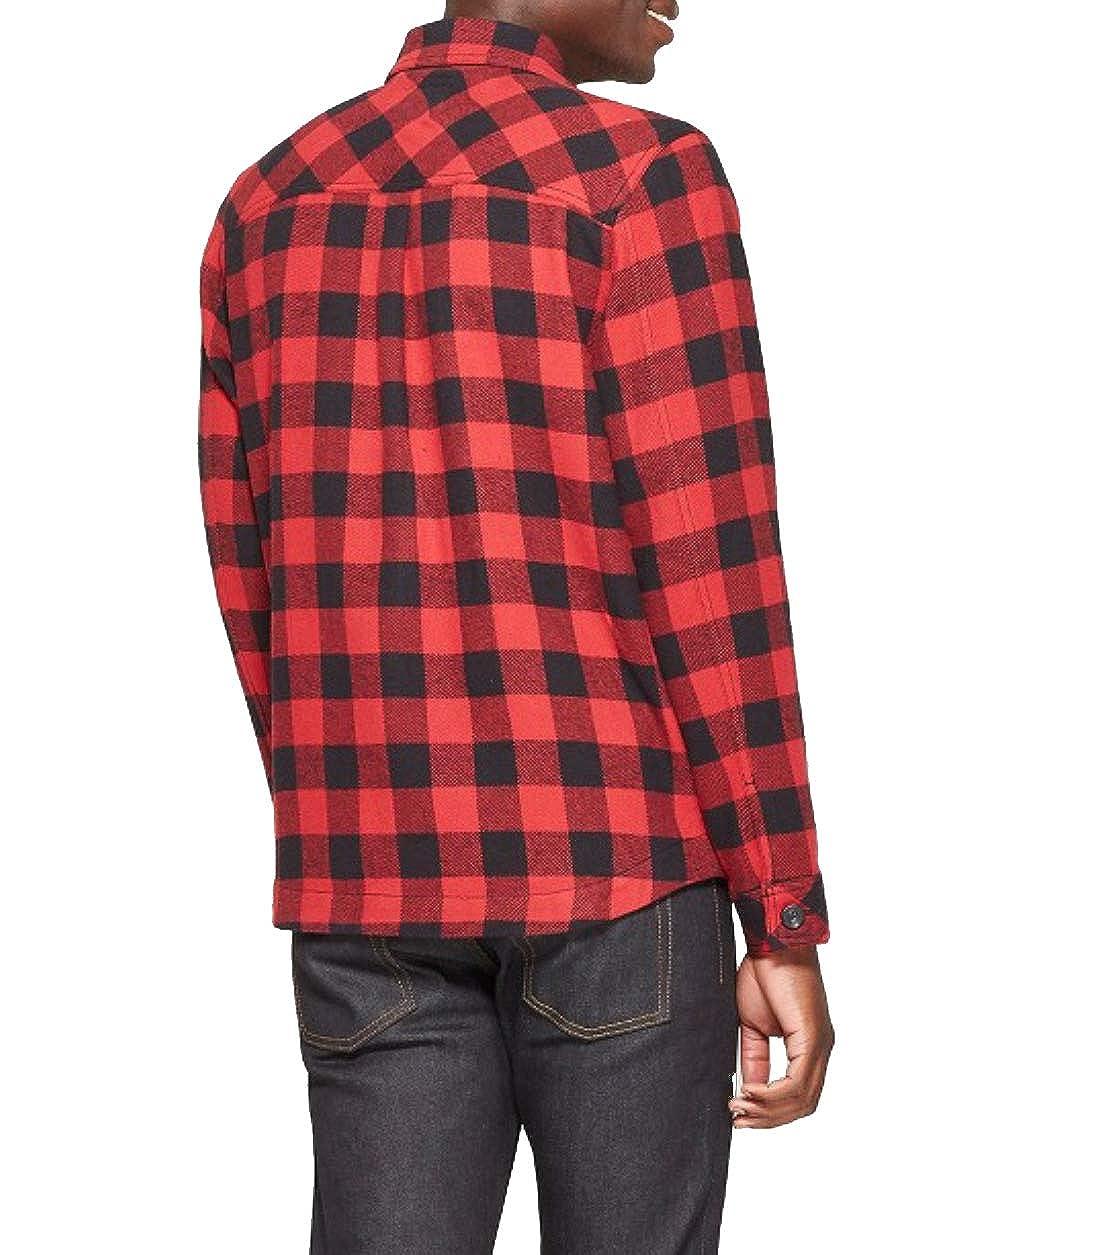 Goodfellow /& Co Mens Long Sleeve Buffalo Check Plaid Shirt Jacket Ripe Red Small